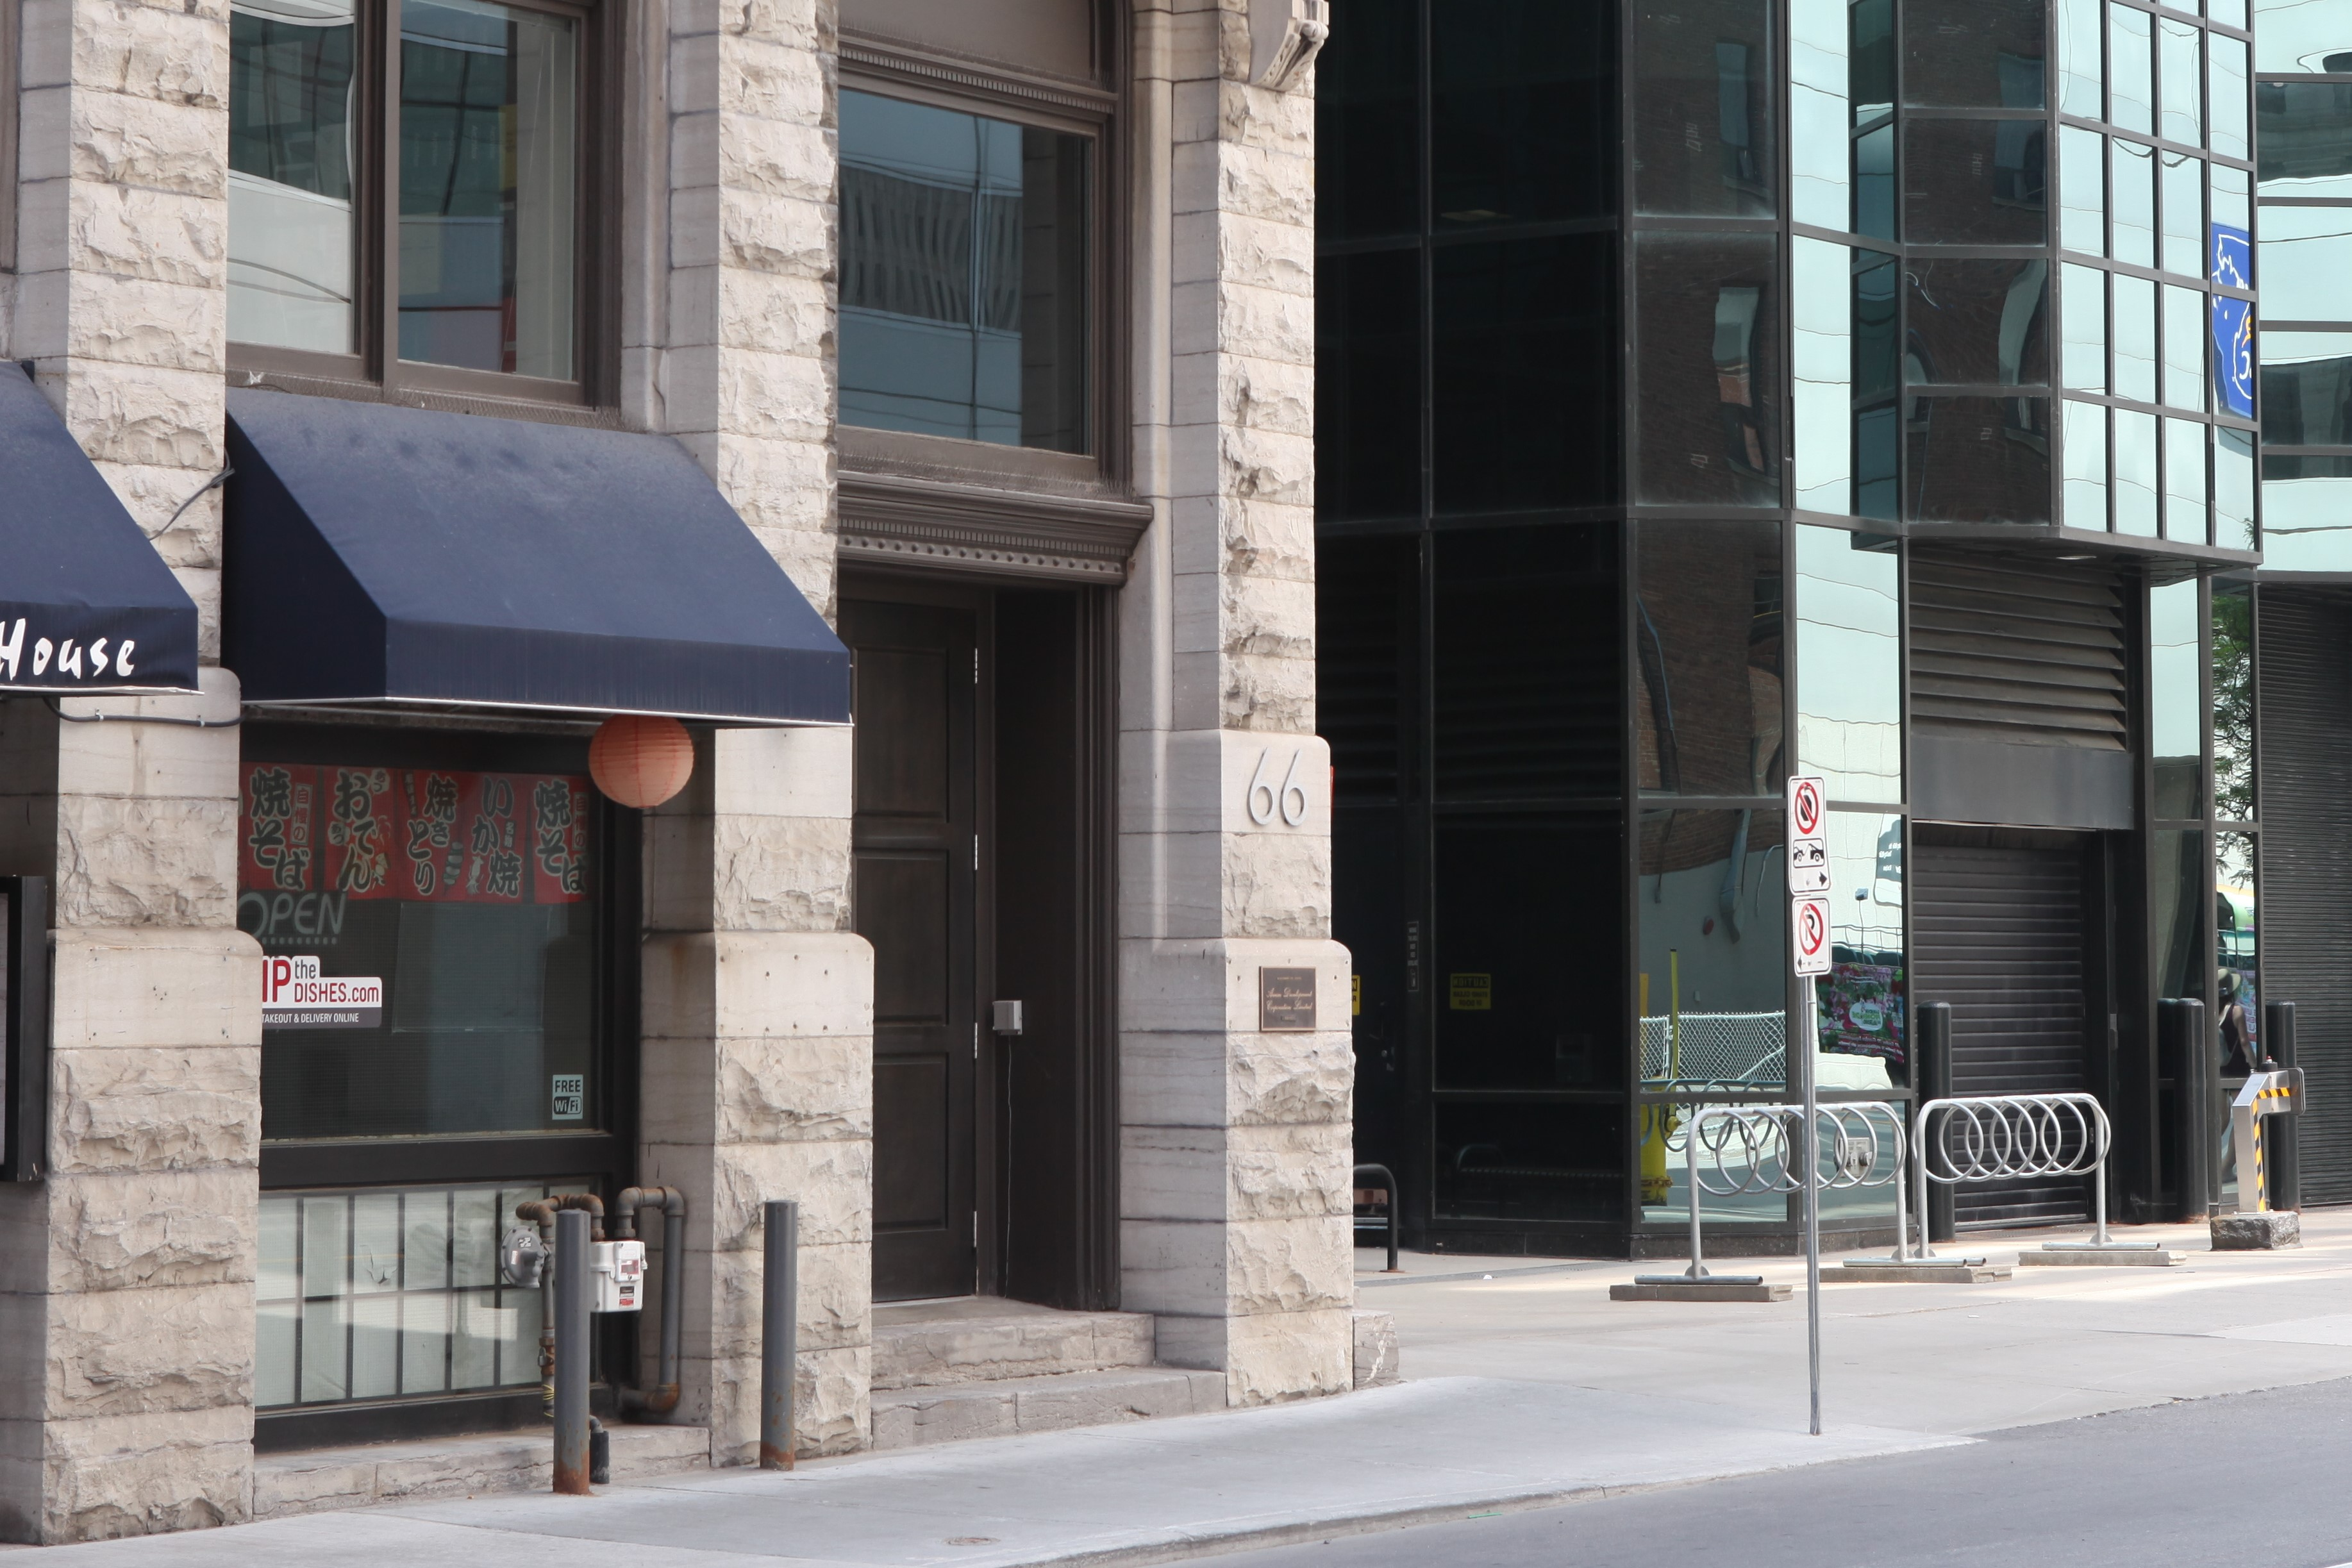 66 Queen Street, Ottawa, ON, Canada, K1P 5C6